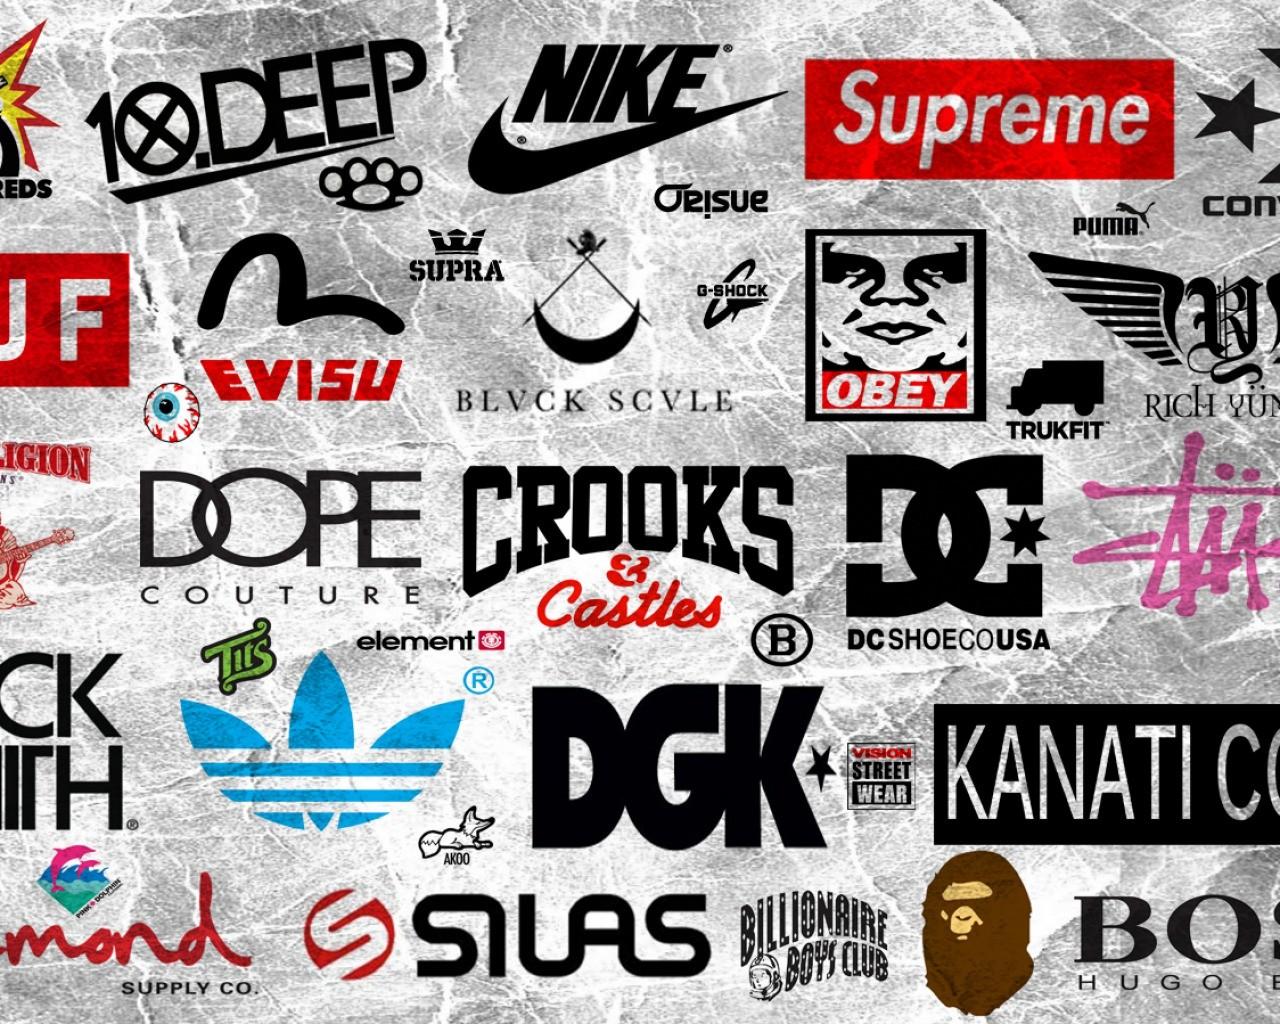 Dope Logo Wallpaper hd Most Dope Logo Wallpaper 1280x1024